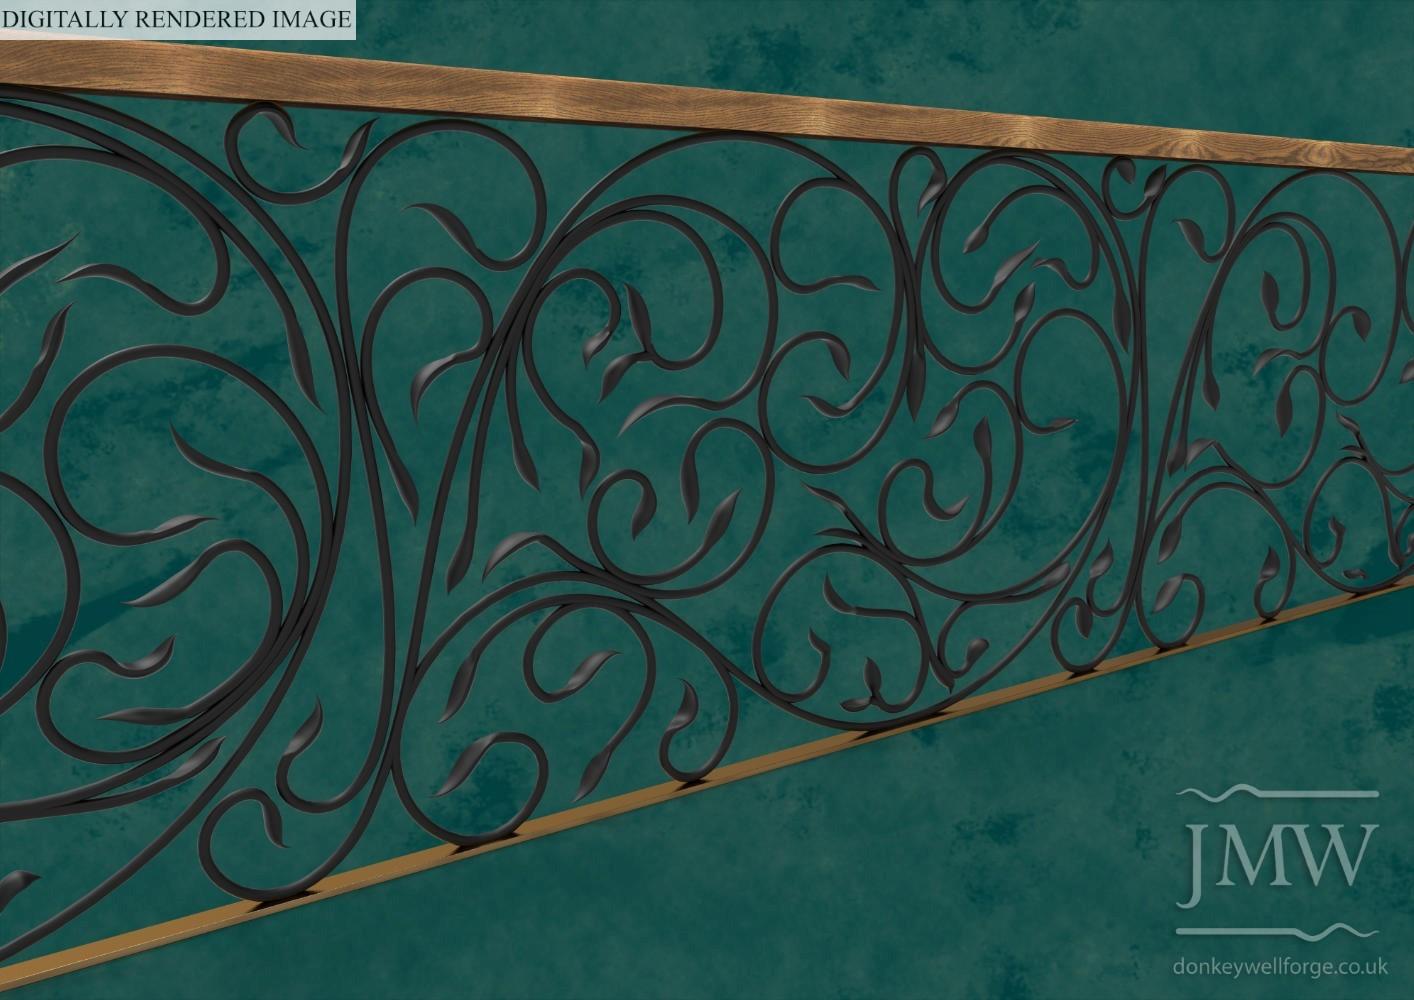 -digitally-rendered-image-decorative-railing-balustrade-forged-ironwork-architectural